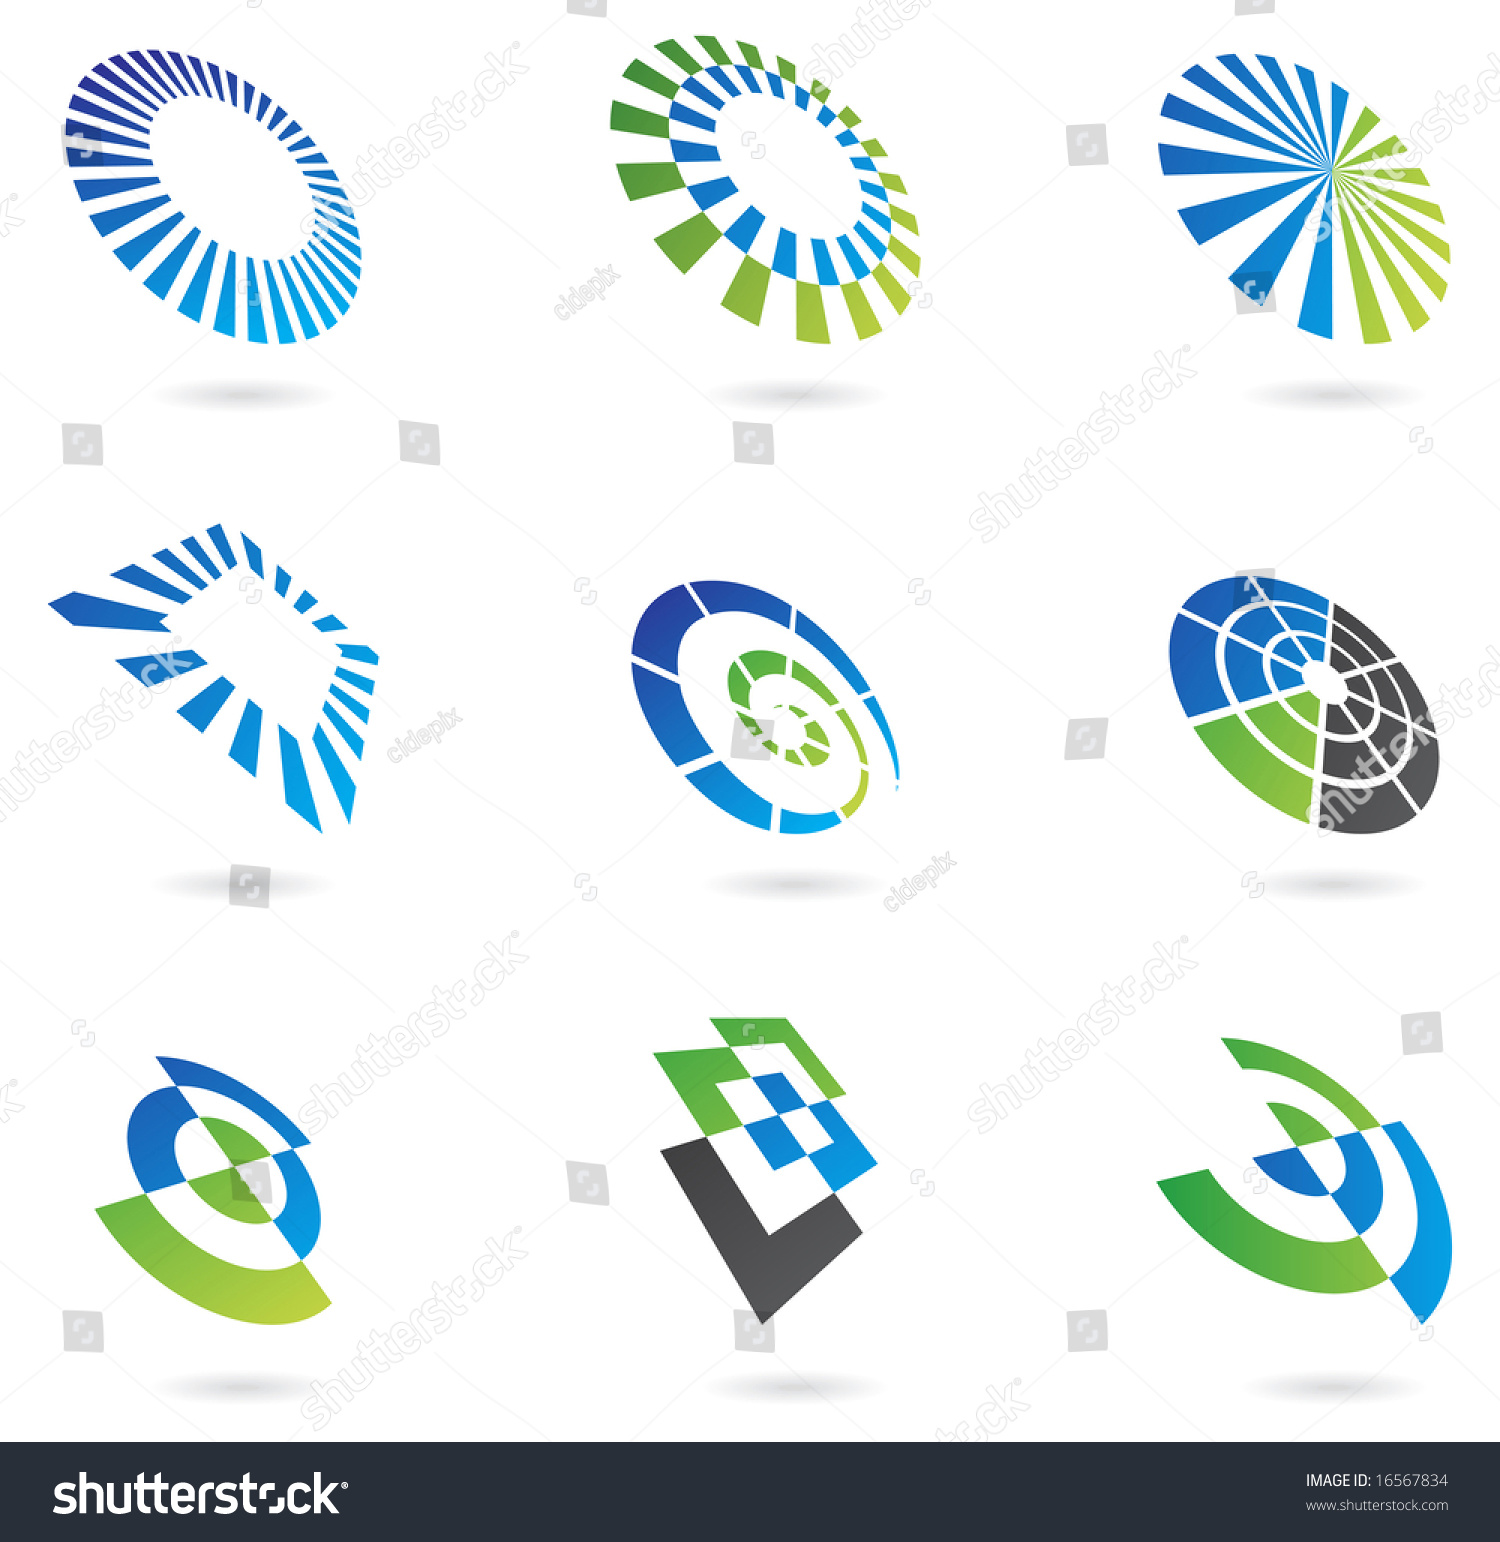 Visual Design Elements : Logos graphic design elements stock vector